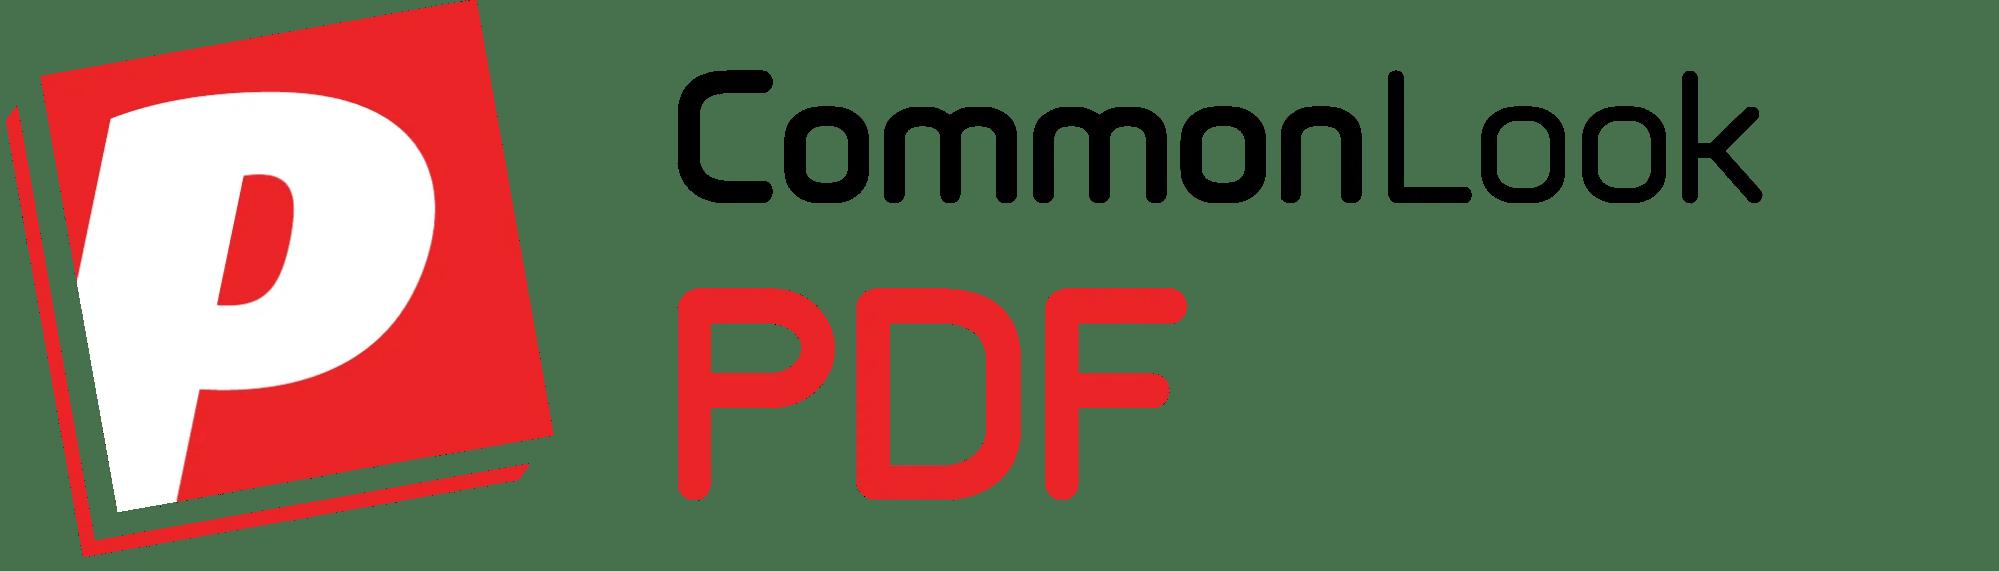 hight resolution of commonlook pdf logo